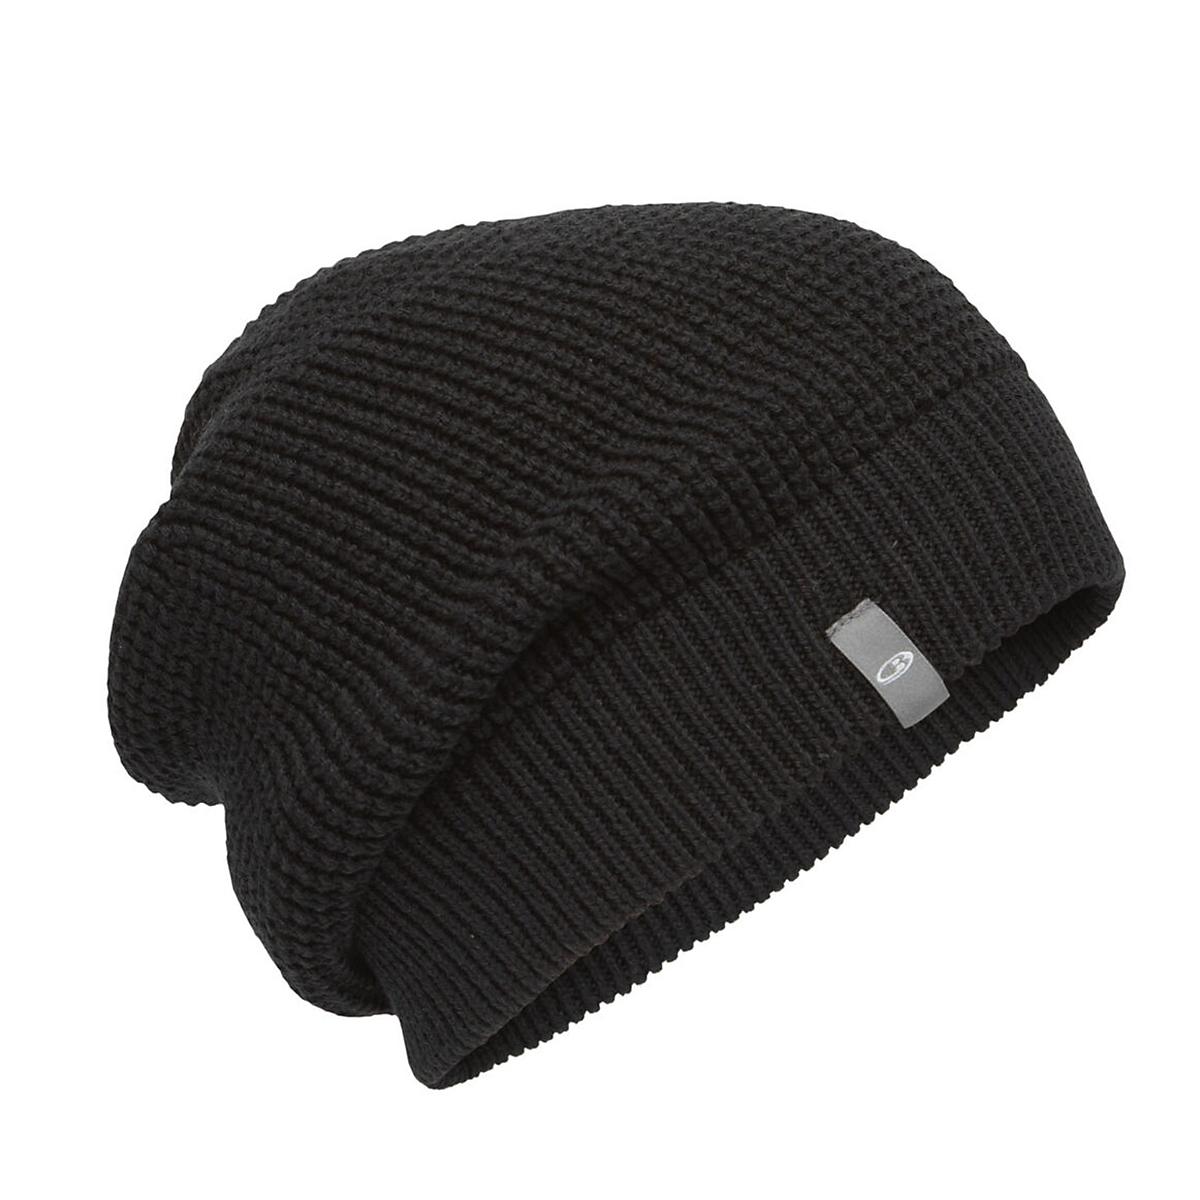 Icebreaker Feadan Slouch Beanie  - Color: Black, Black, large, image 1